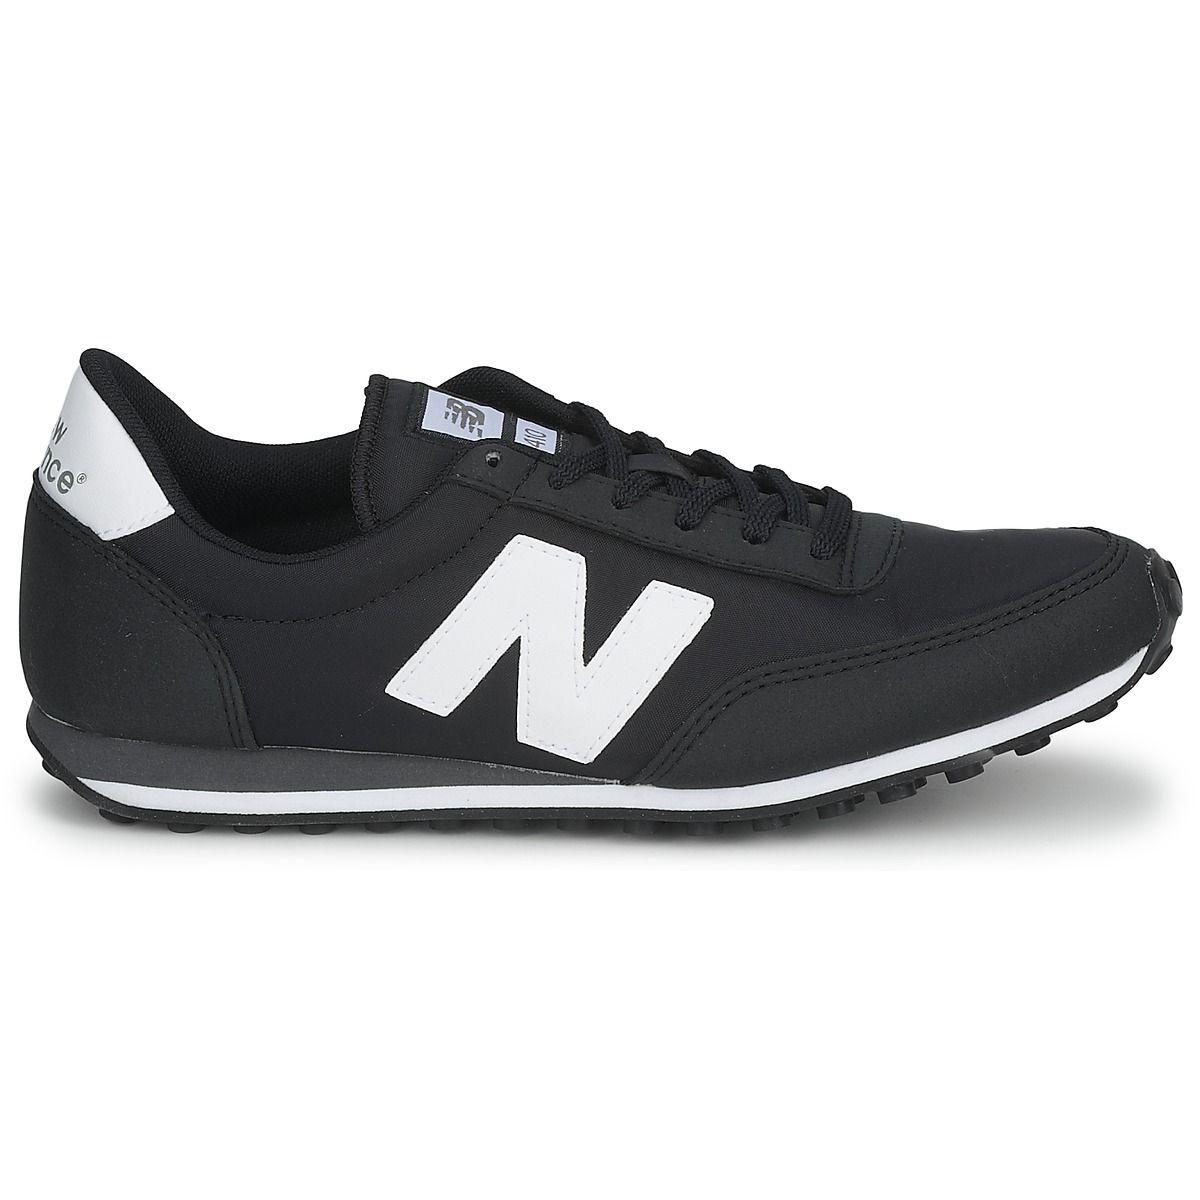 New Balance U410 New Balance Shoes Shoes New Balance 410